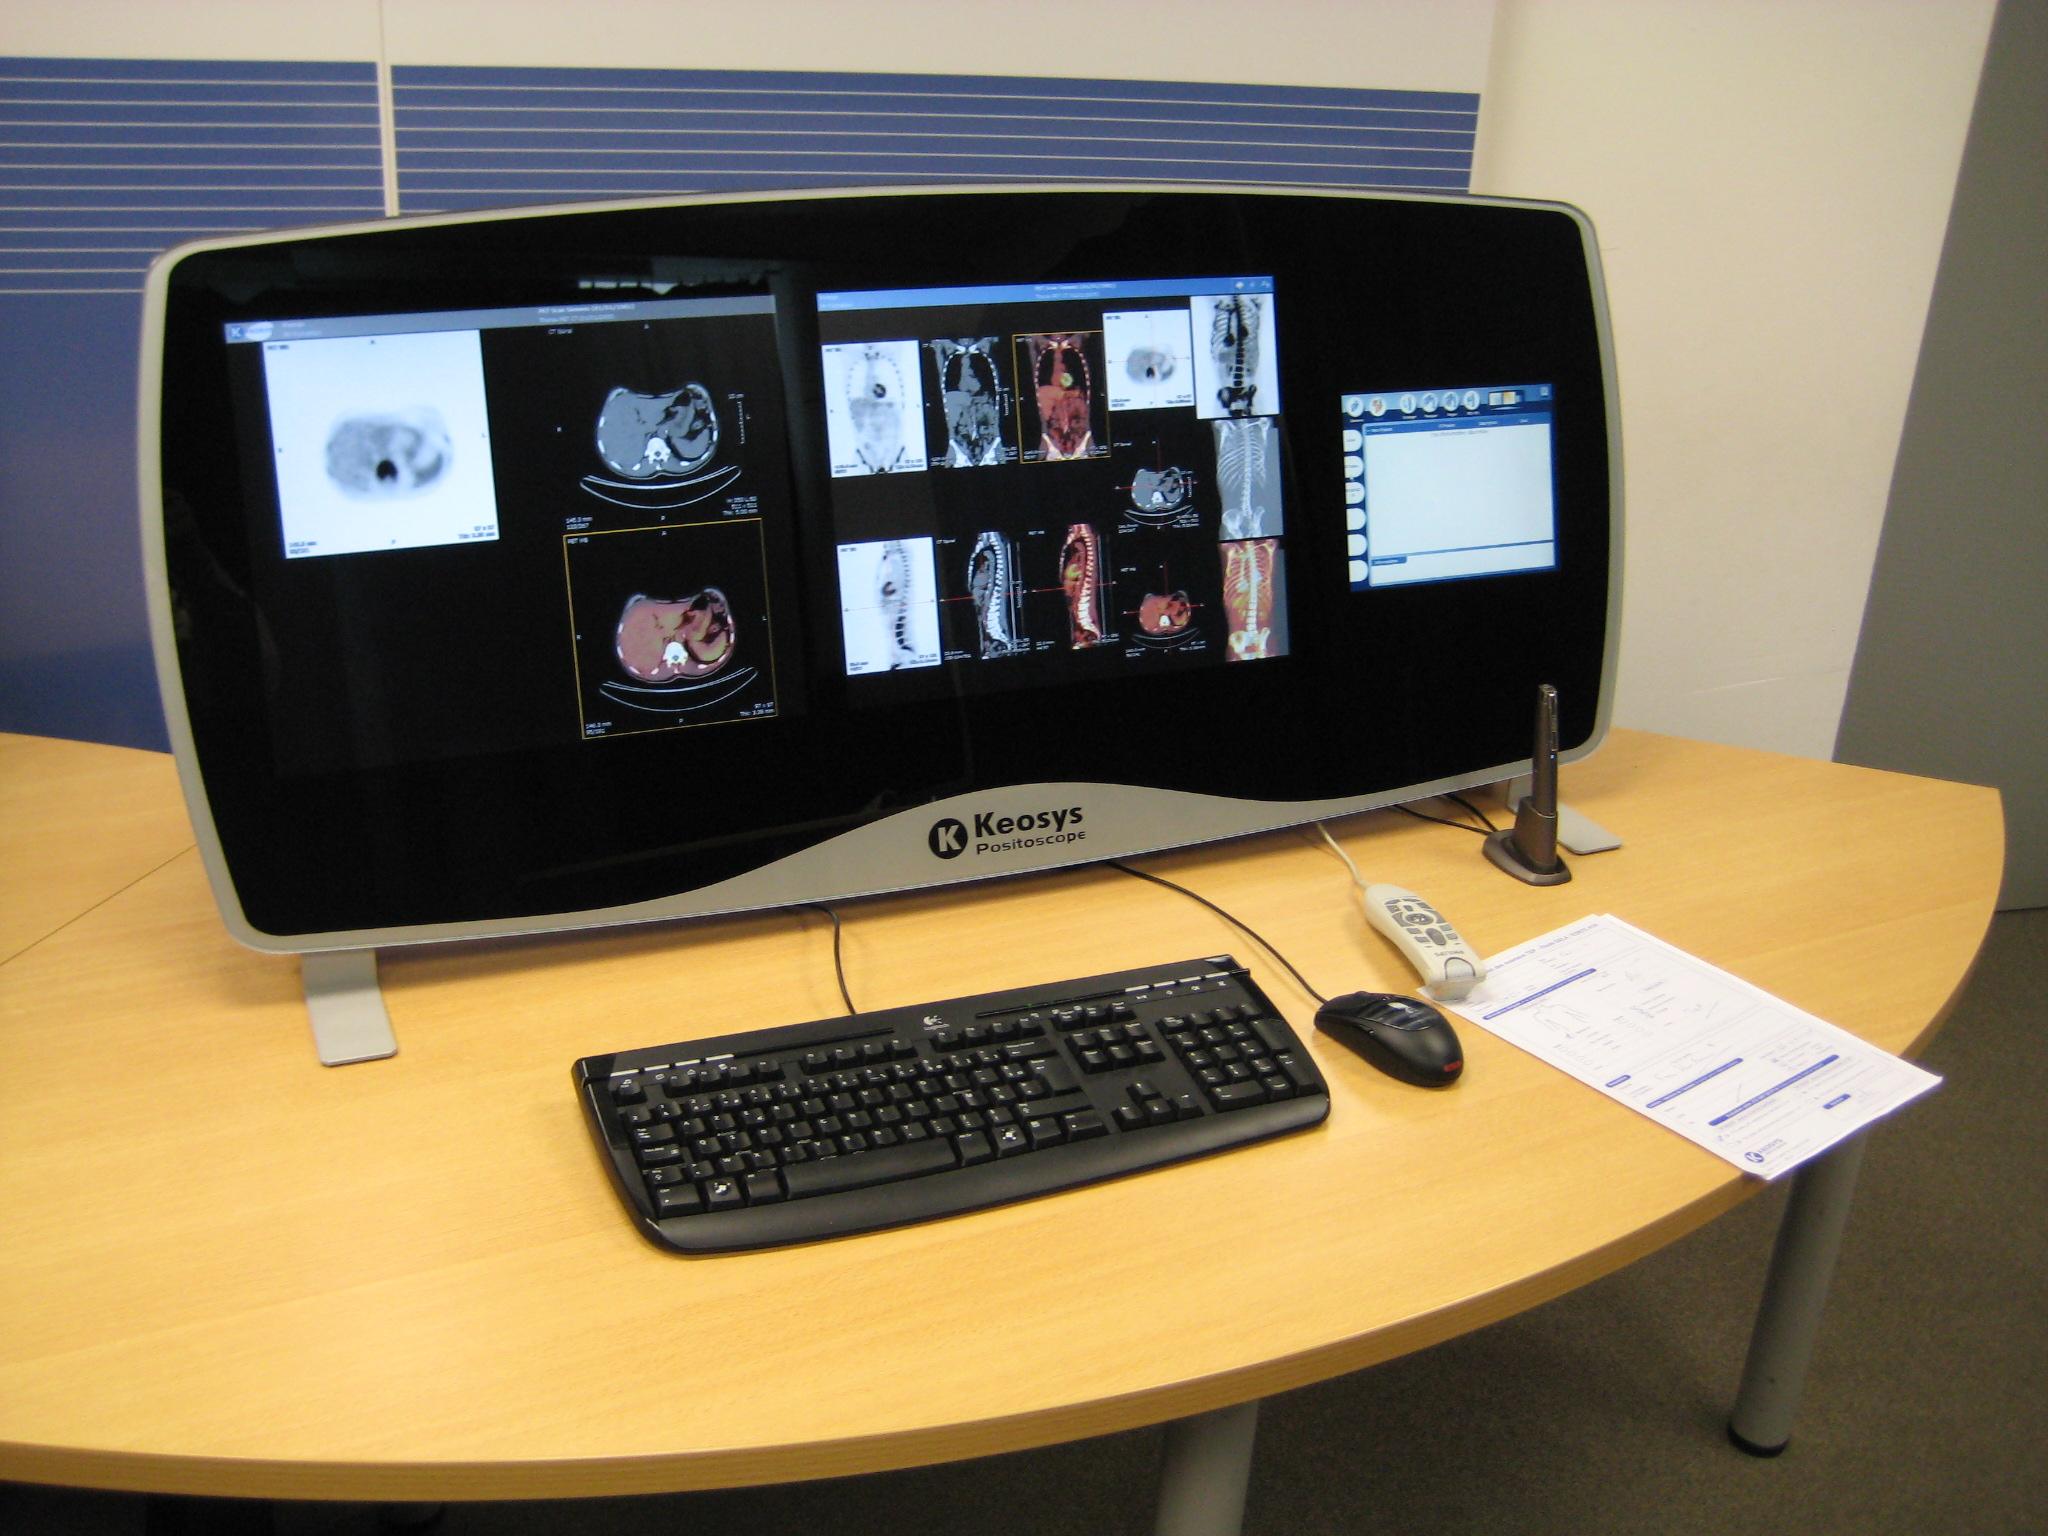 file estacion de trabajo medical keosys jpg wikimedia